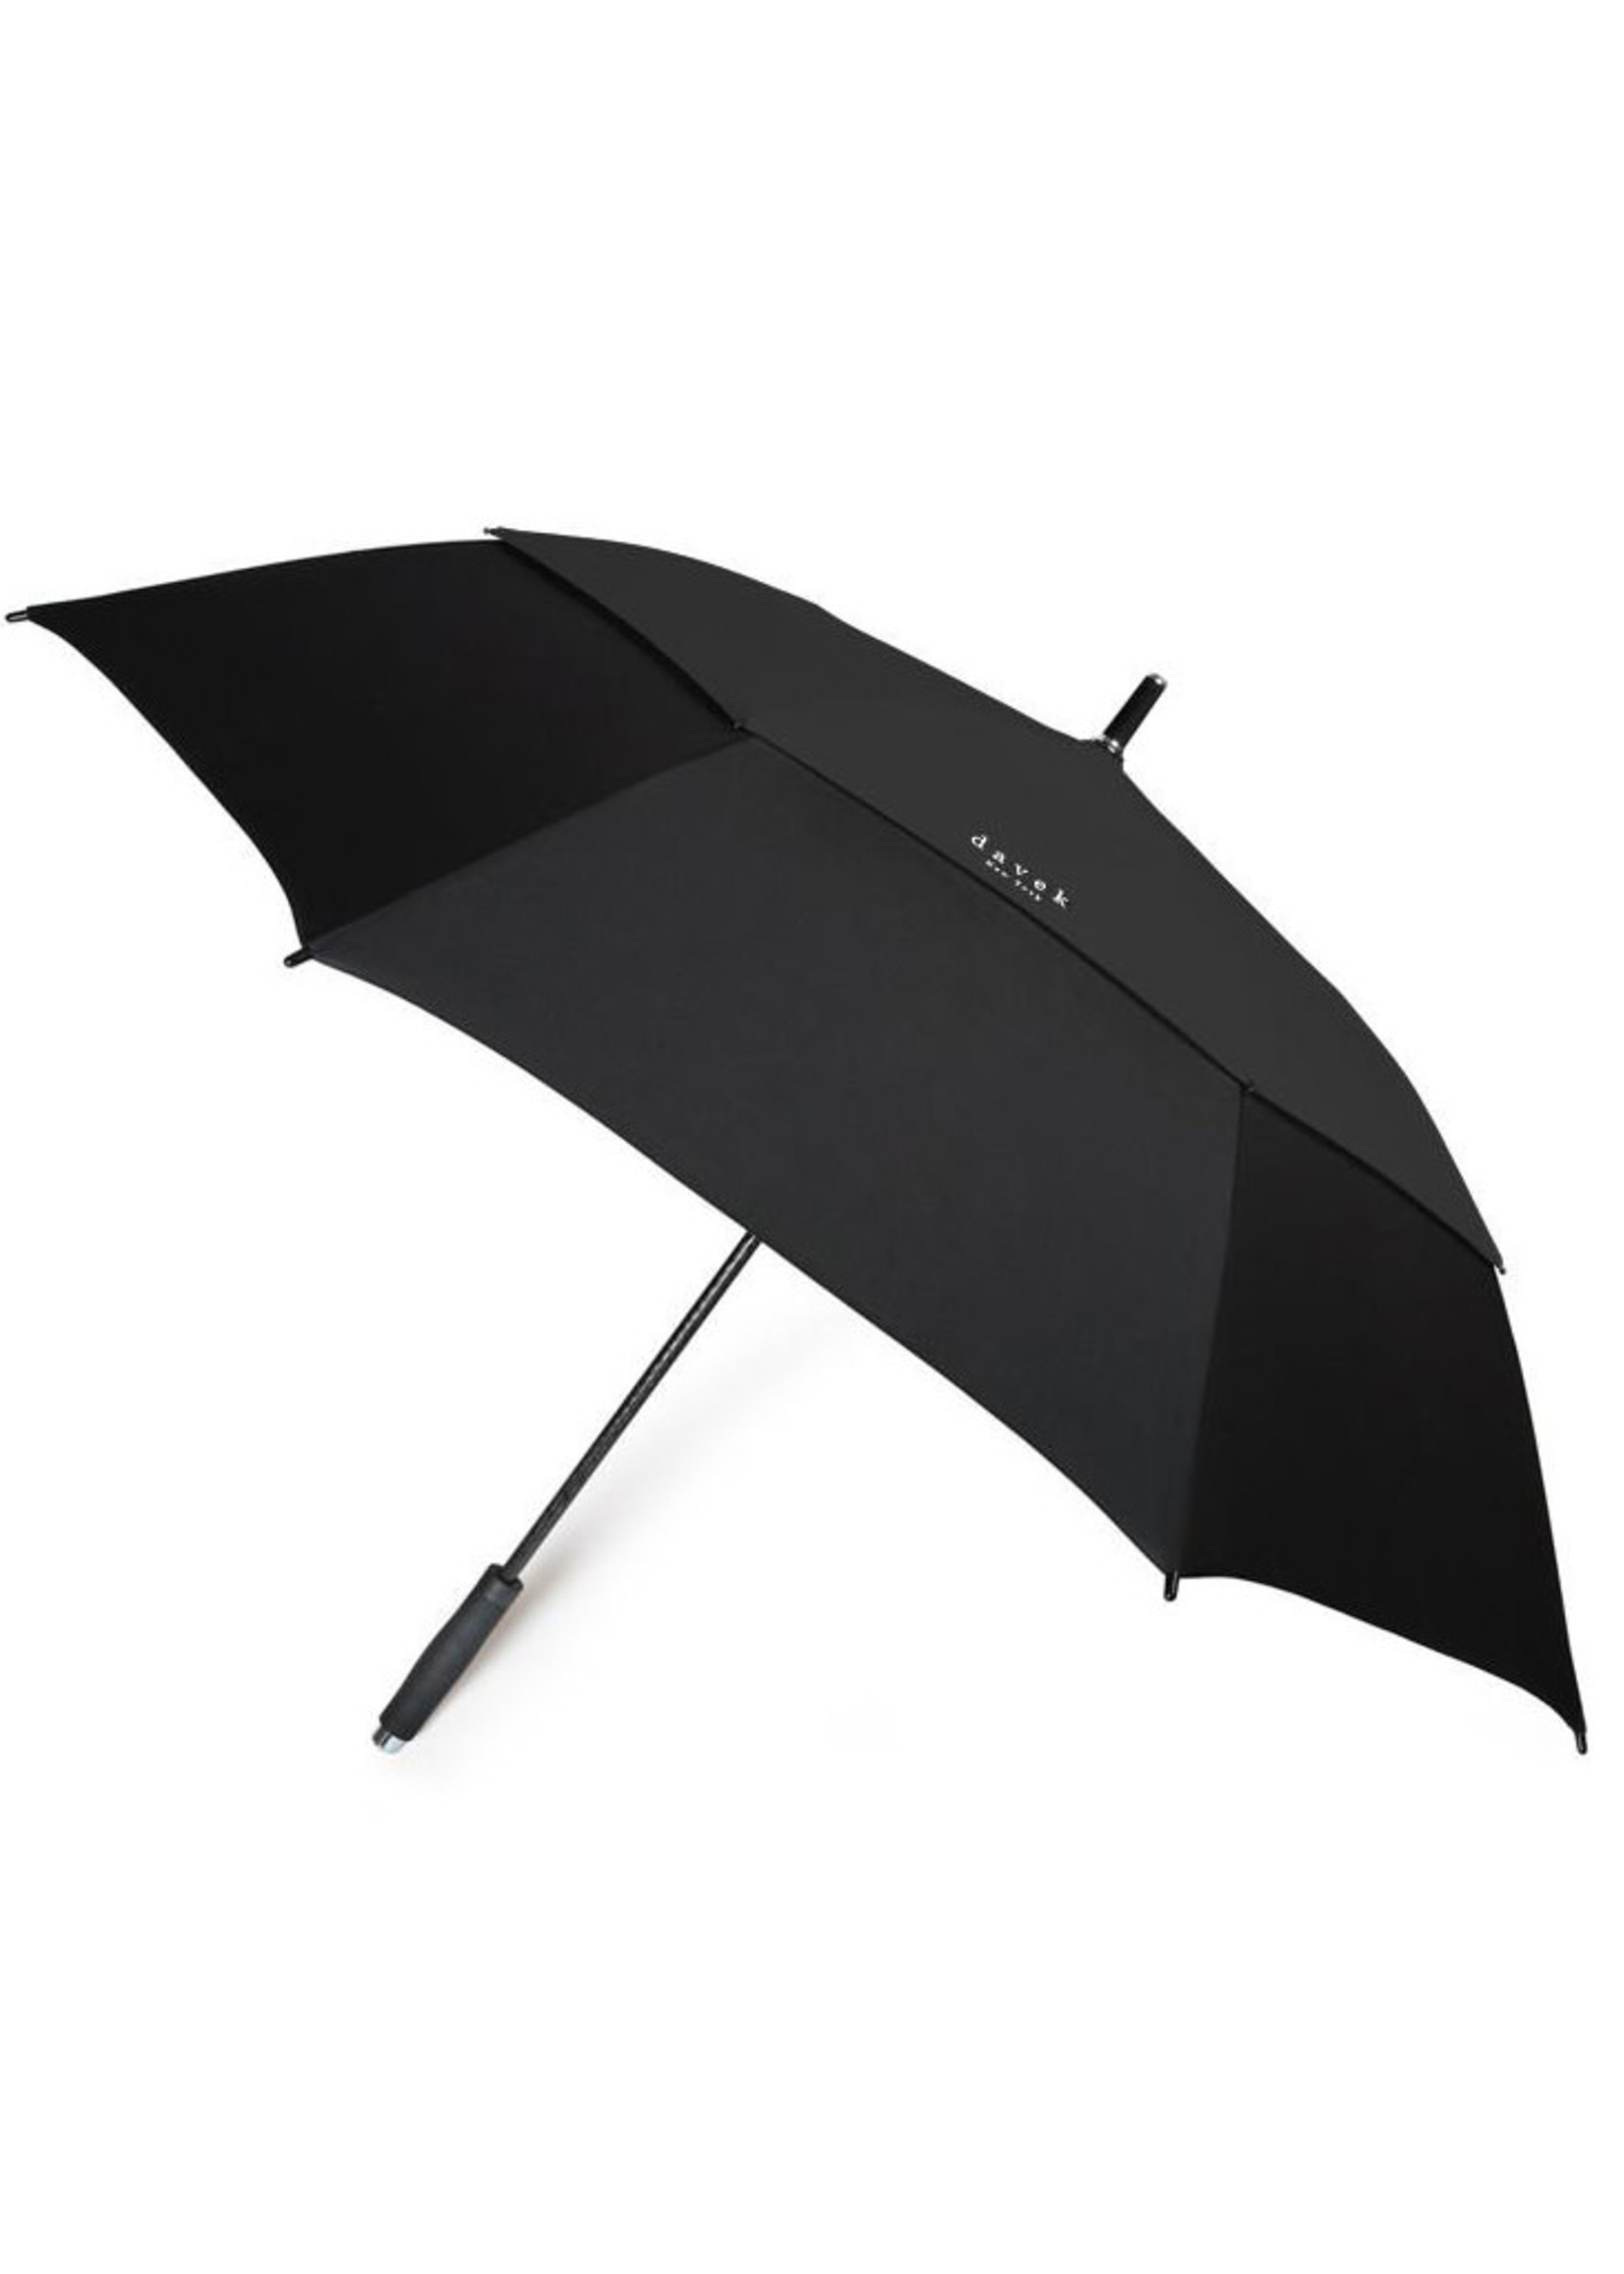 Davek Golf Umbrella Black